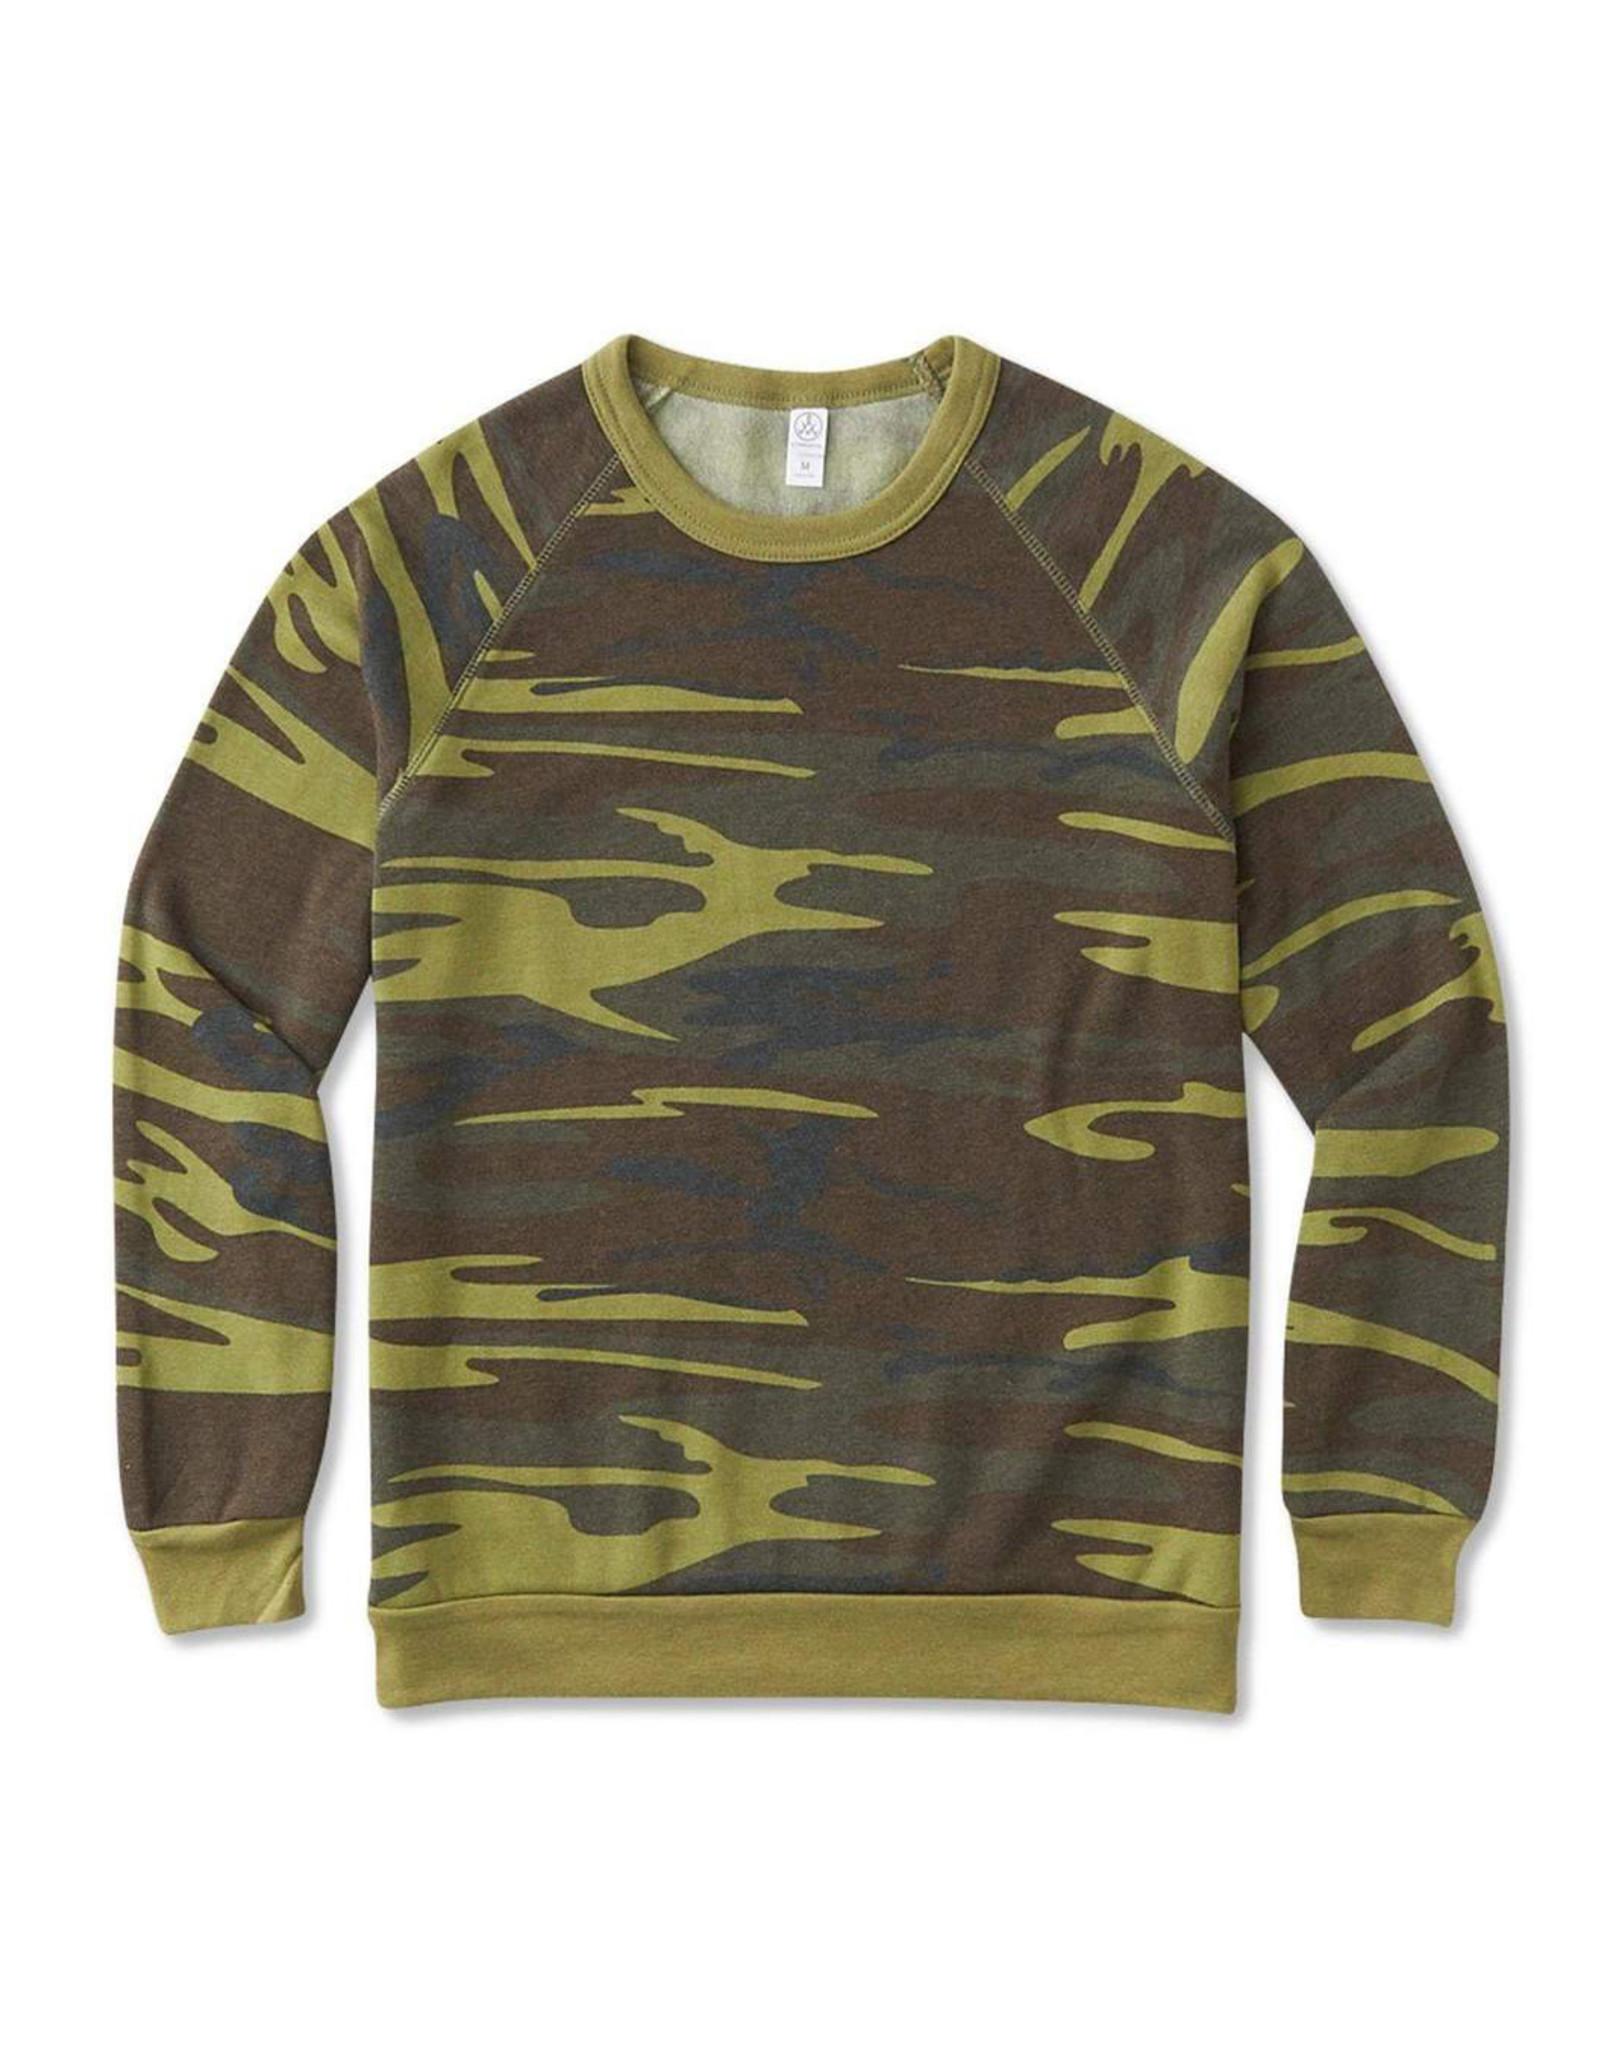 Alternative Apparel Eco-Fleece Champ Sweatshirt - Camo